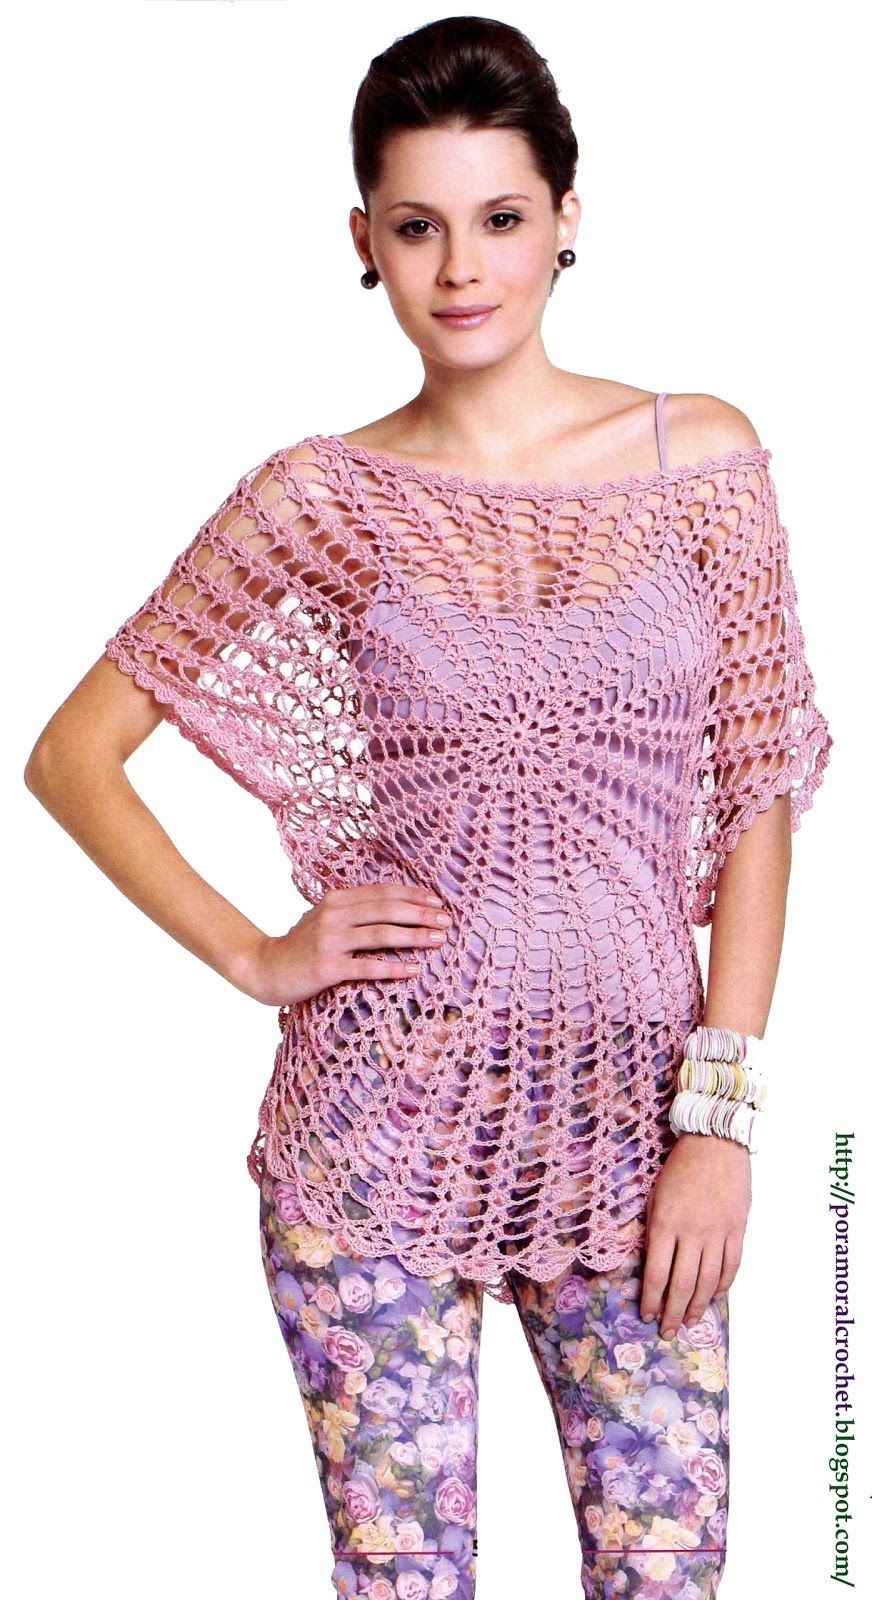 Pin de Sjmahant en Crochet Tops | Pinterest | Trenza, Tejido y Verano